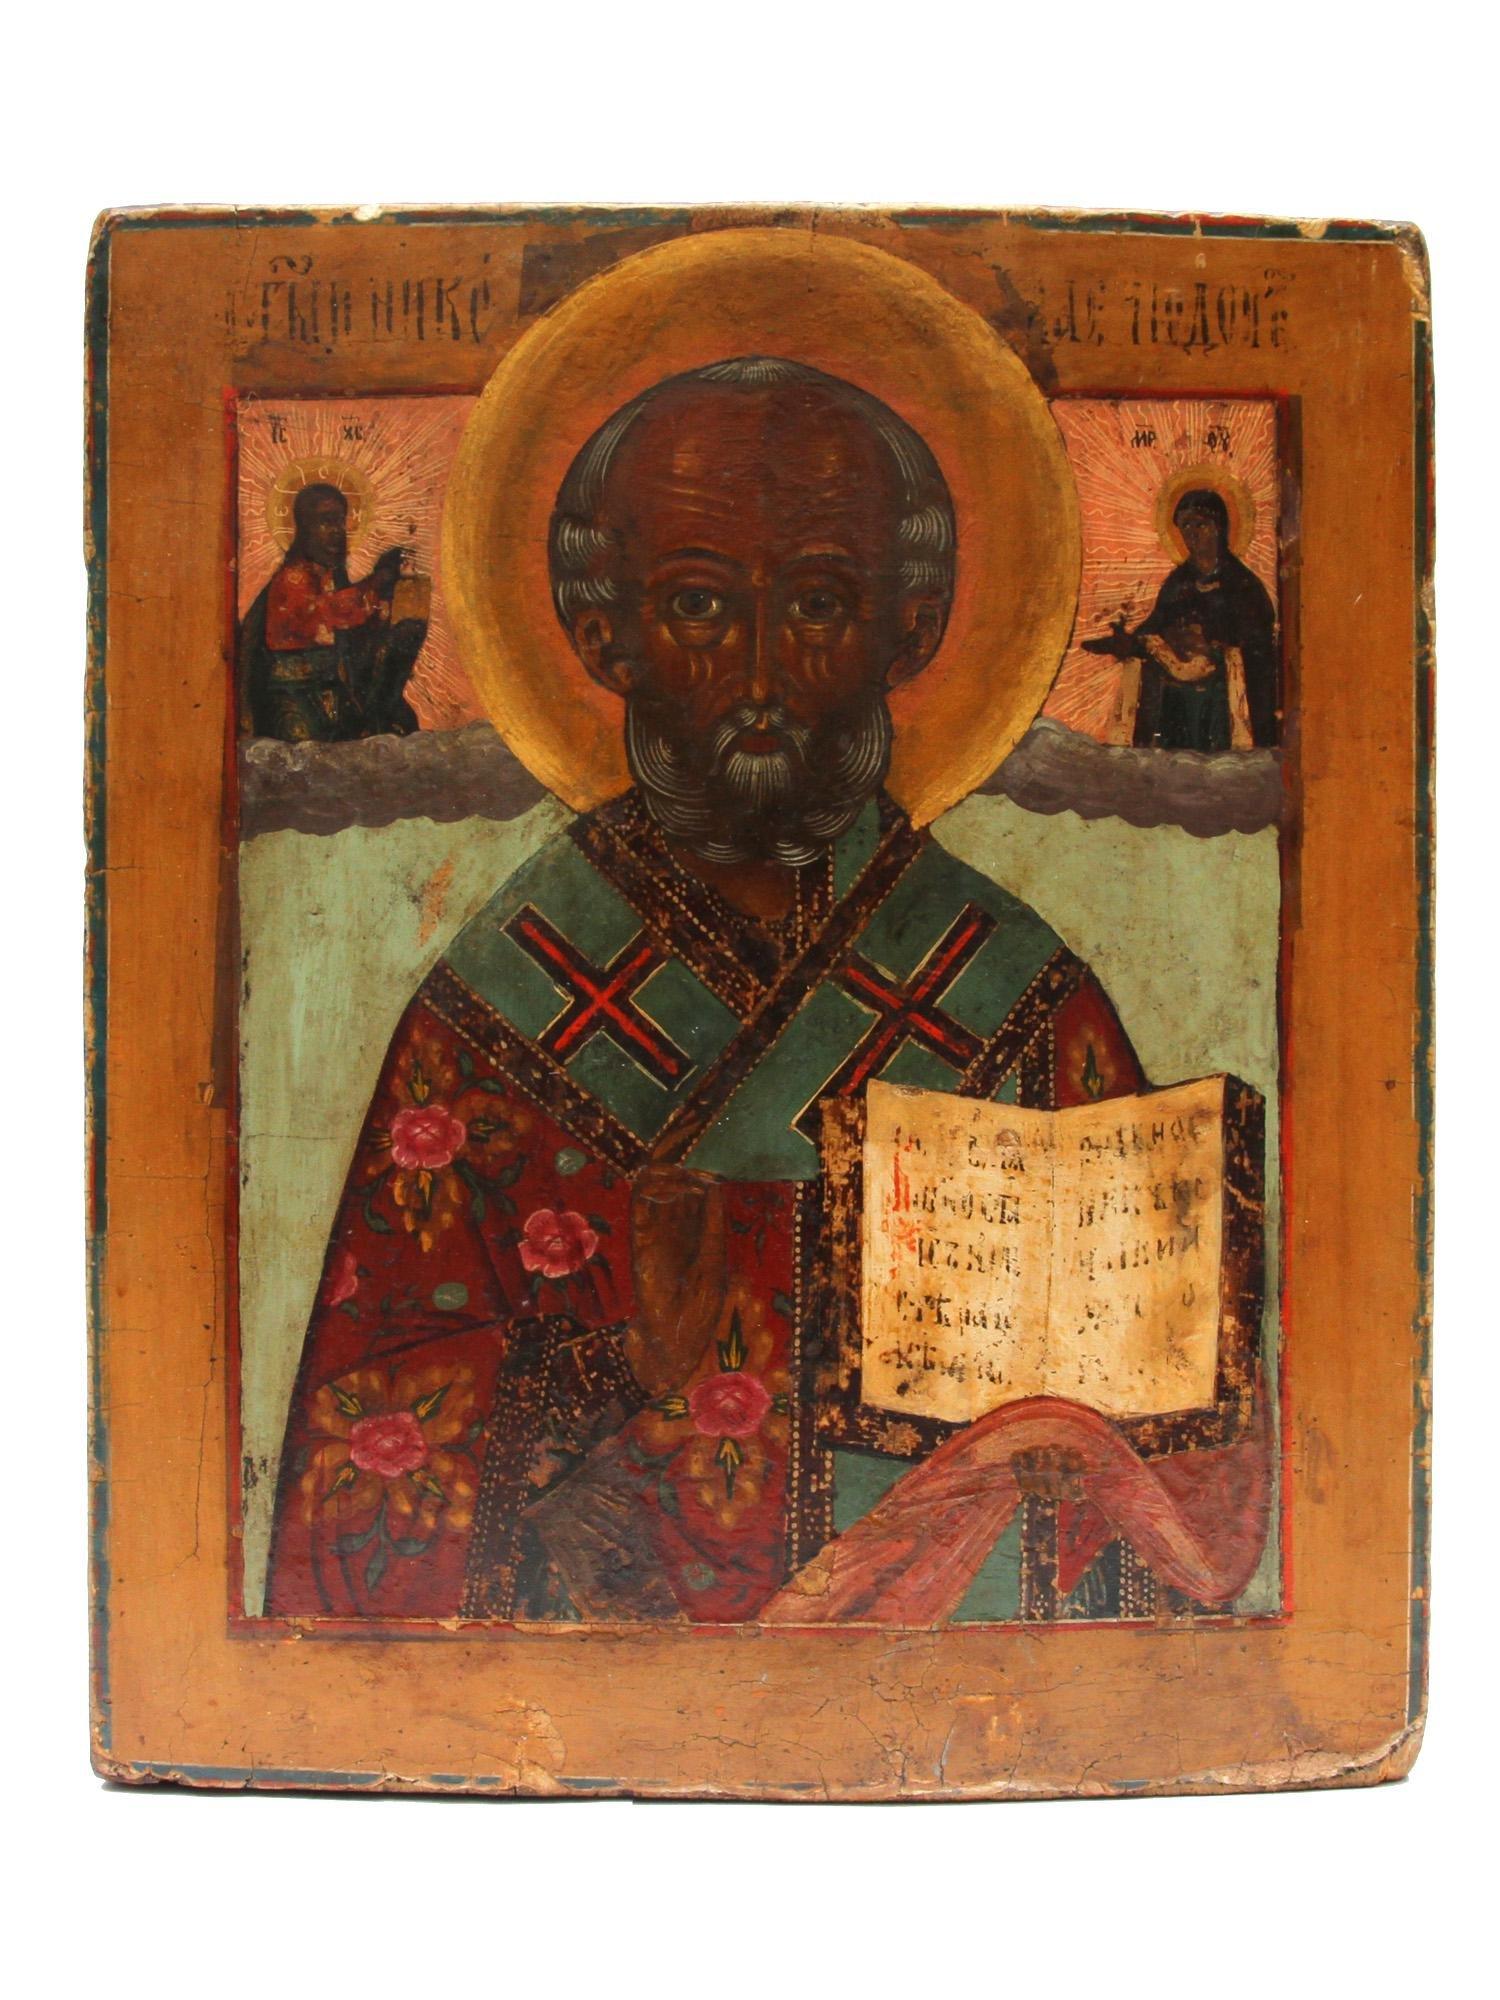 A RUSSIAN ORTHODOX ICON OF ST. NICHOLAS, 19TH C.